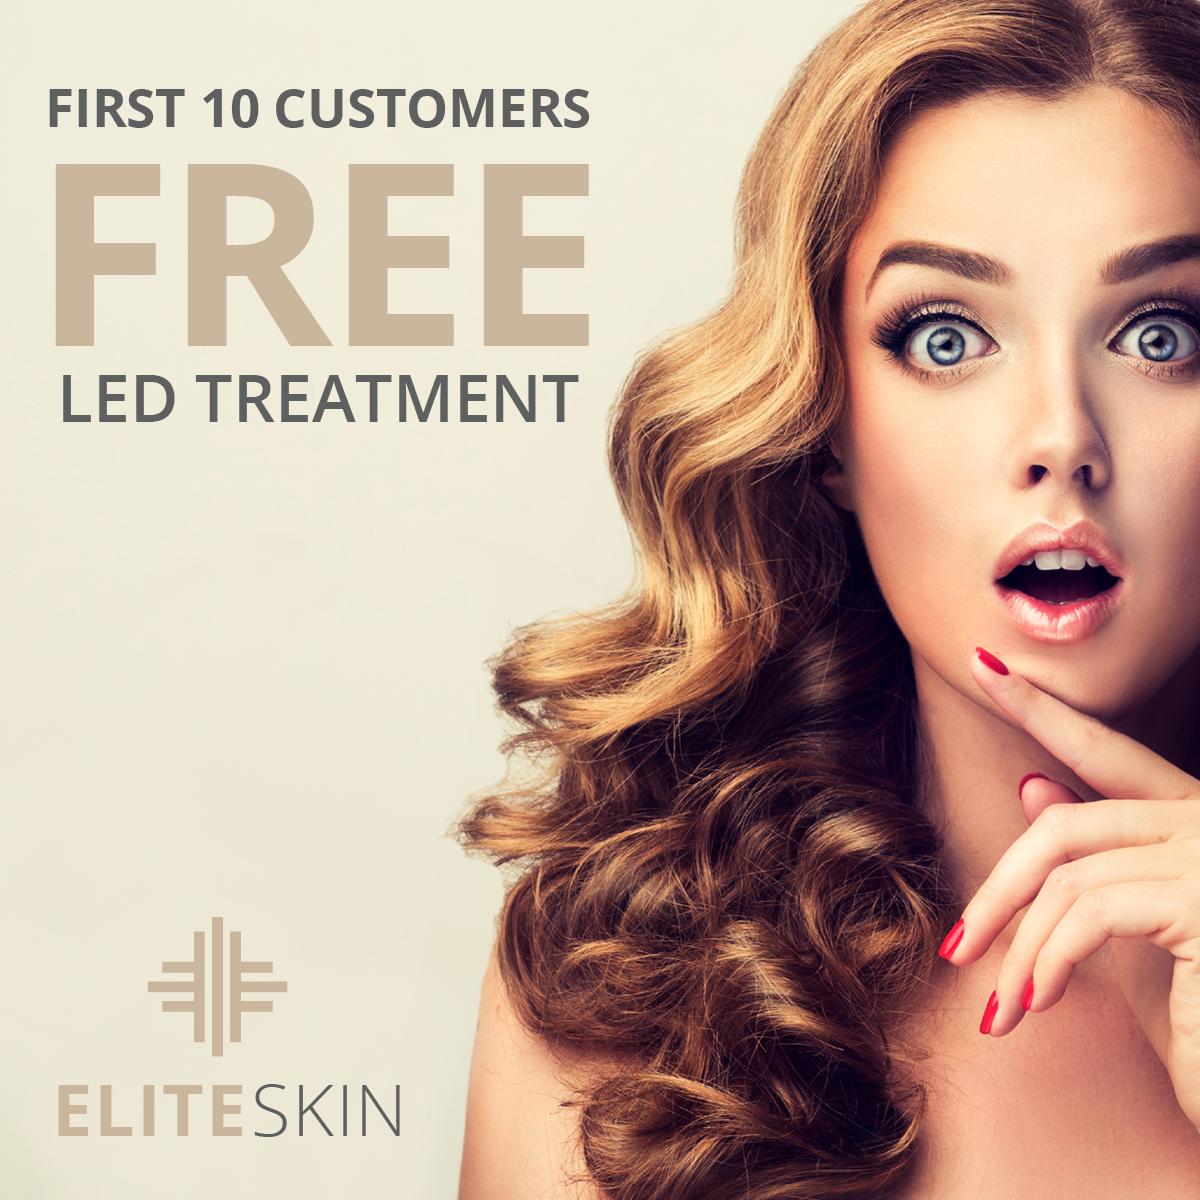 Elite-Skin-Free-LED-FBTile